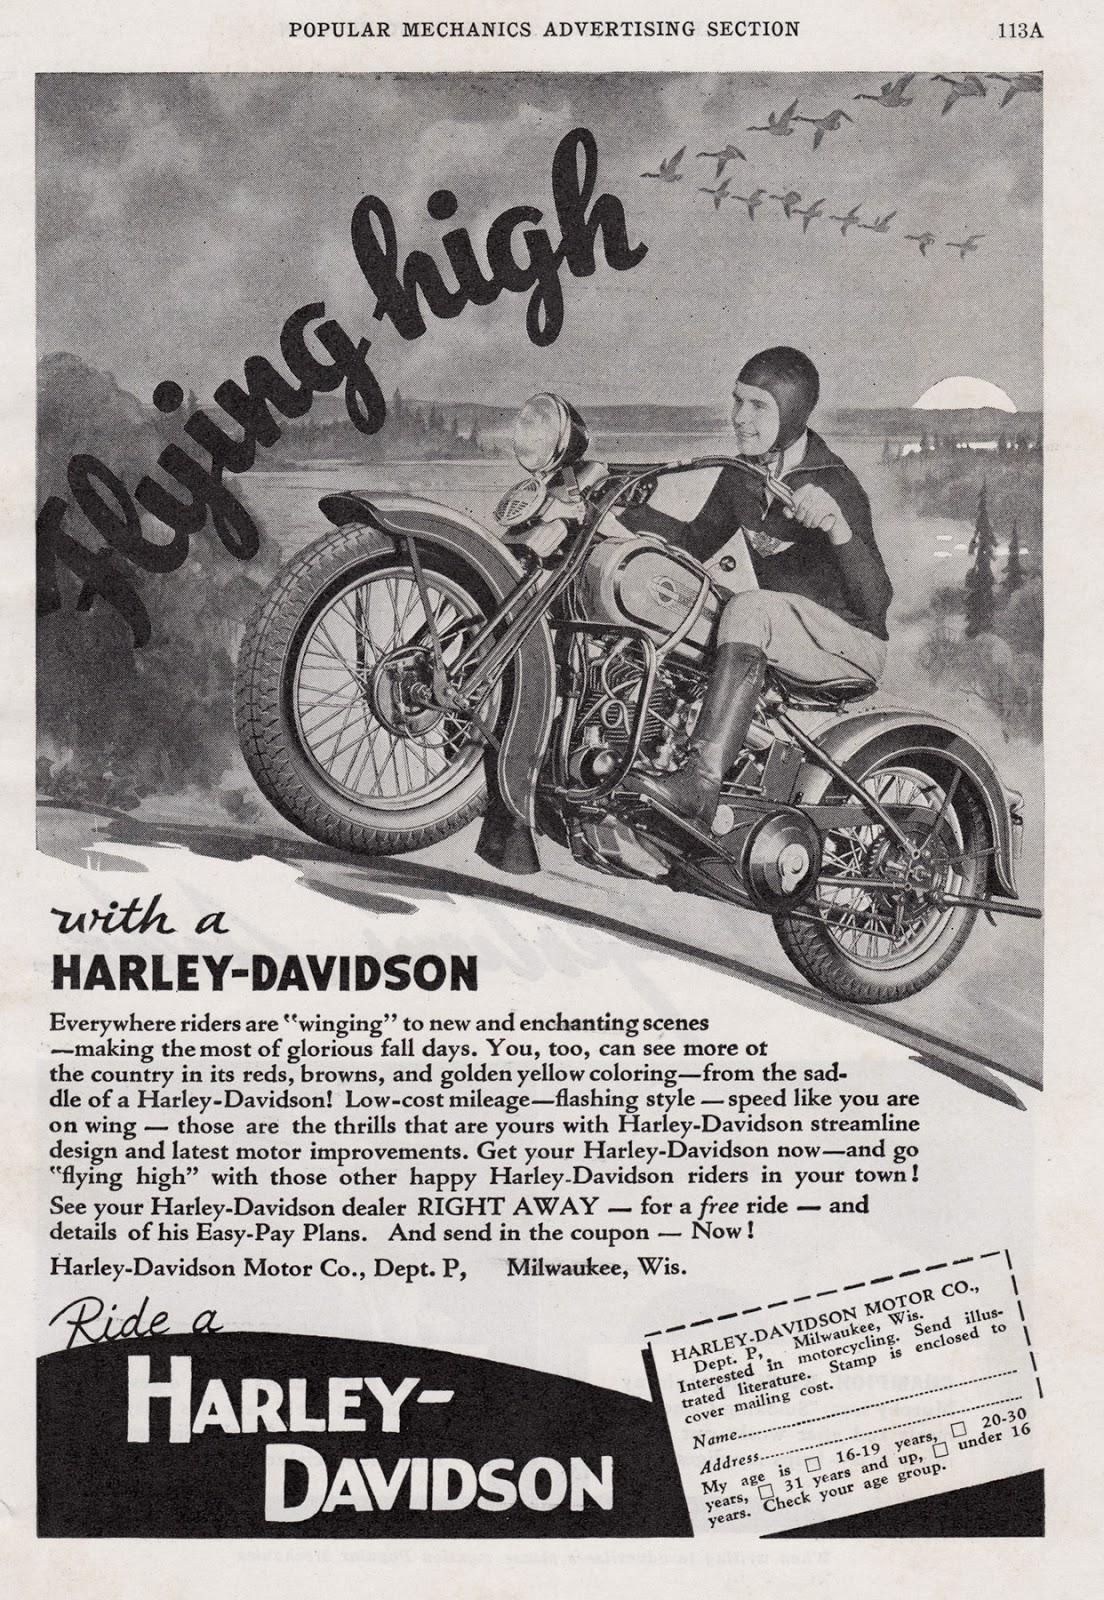 Harley Davidson Advertising: Ghosts Of The Great Highway: Retro Rewind. Vintage Harley